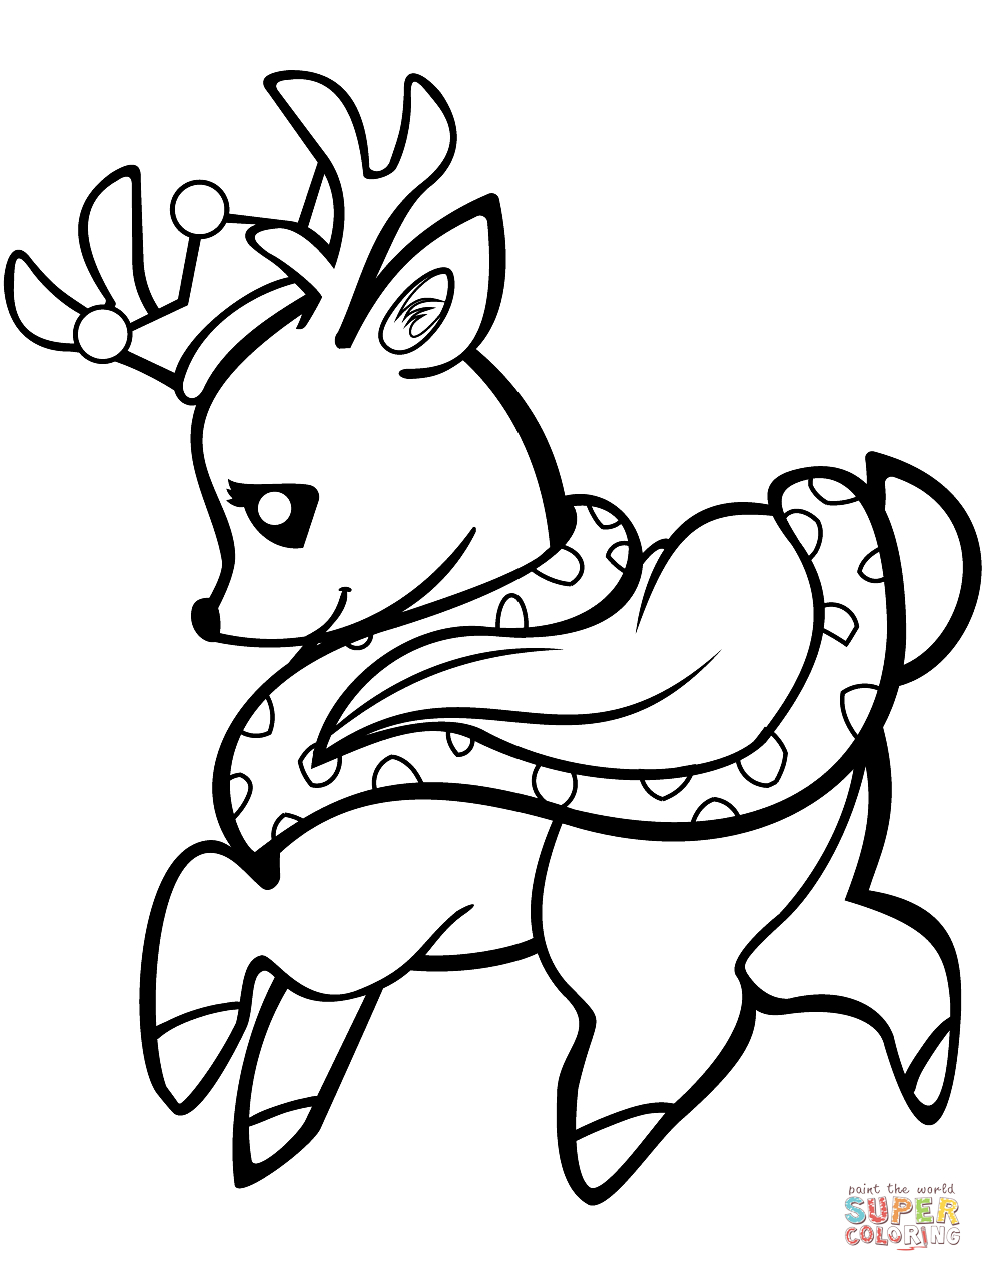 Deer Coloring Pages Ba Deer In A Crown Coloring Page Free Printable Coloring Pages